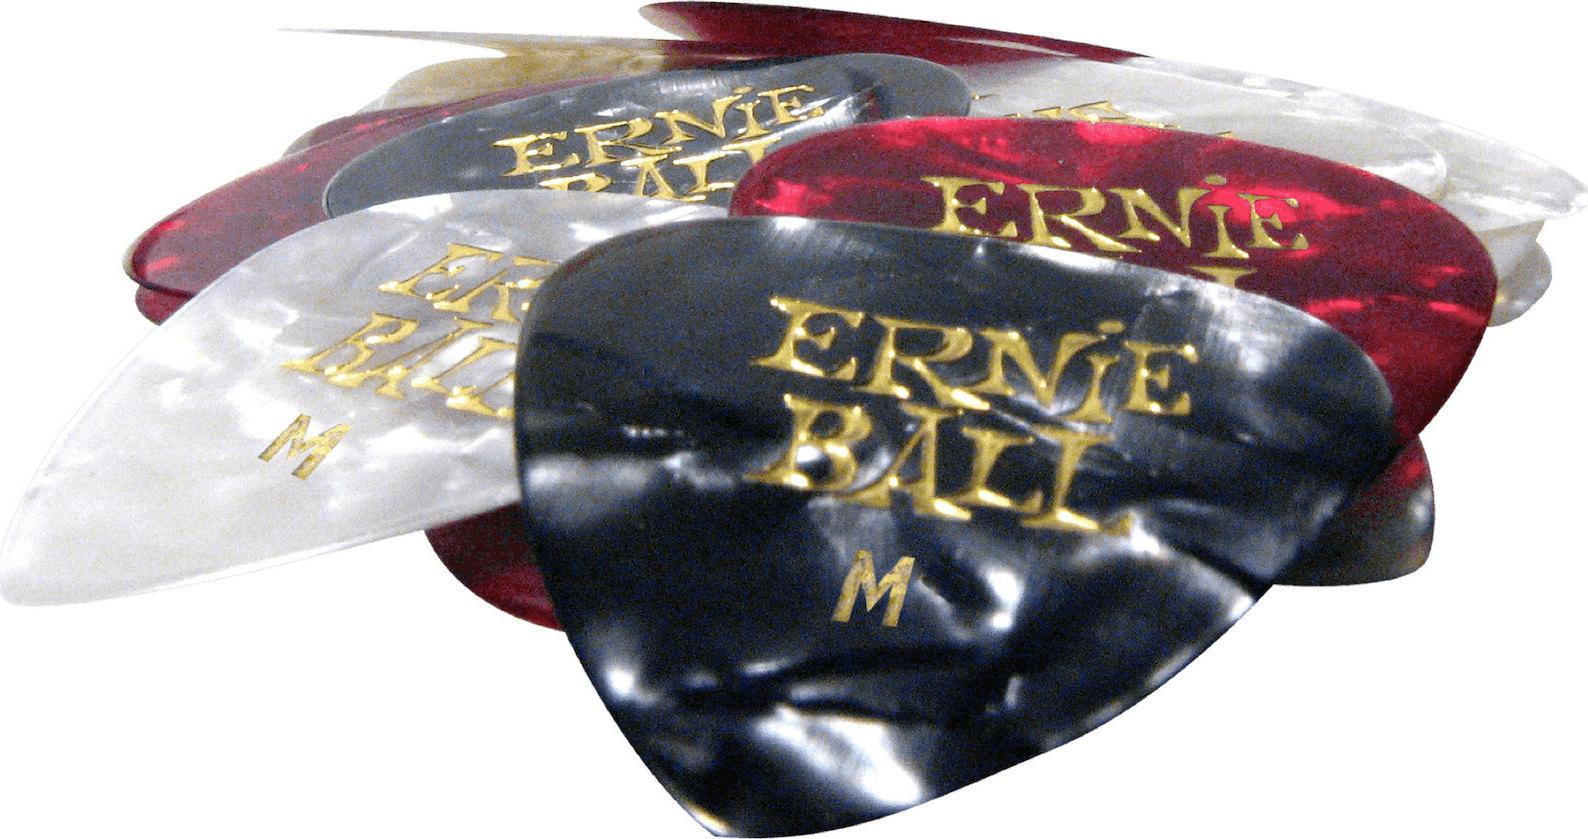 Ernie Ball Pearloid Cellulose Medium P09166-1 Mixed Color 0.72mm 1τμχ - Skroutz.gr